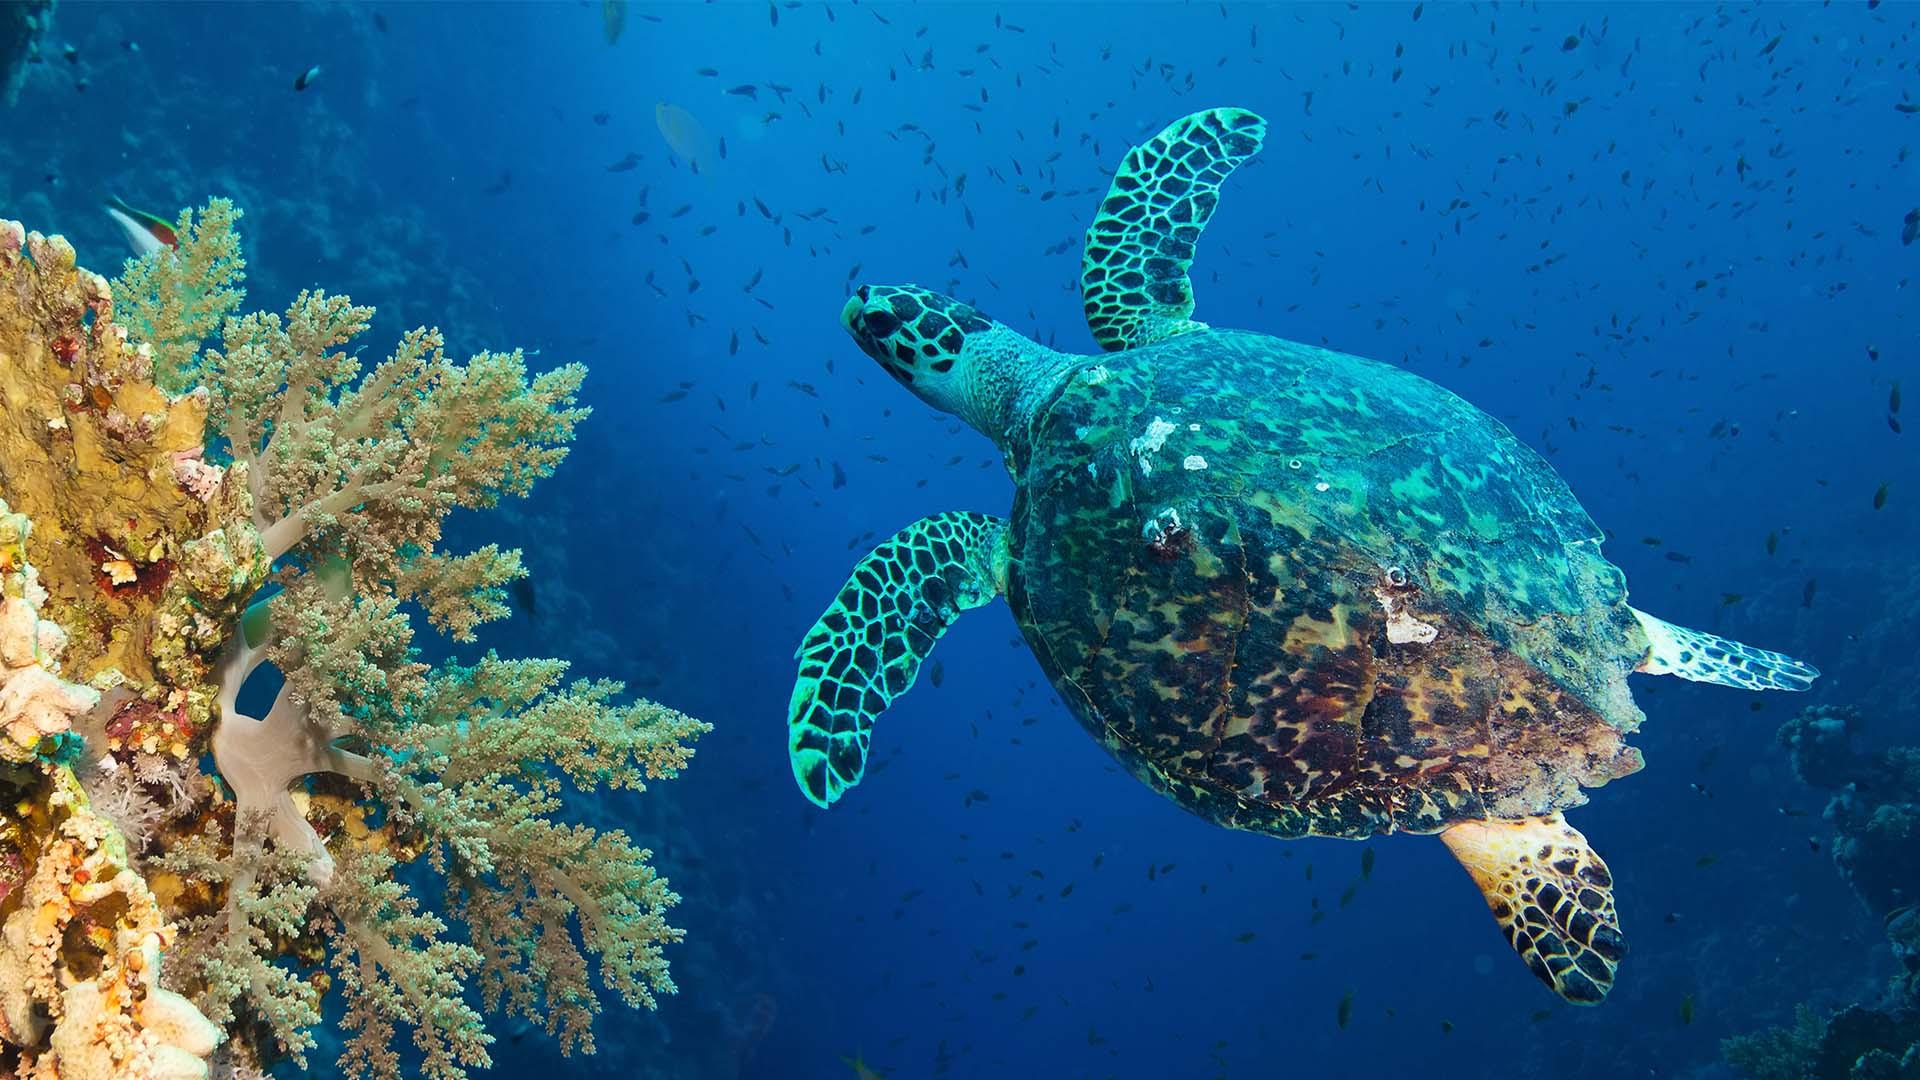 Hawksbill turtle at Coco Bodu Hithi, Maldives